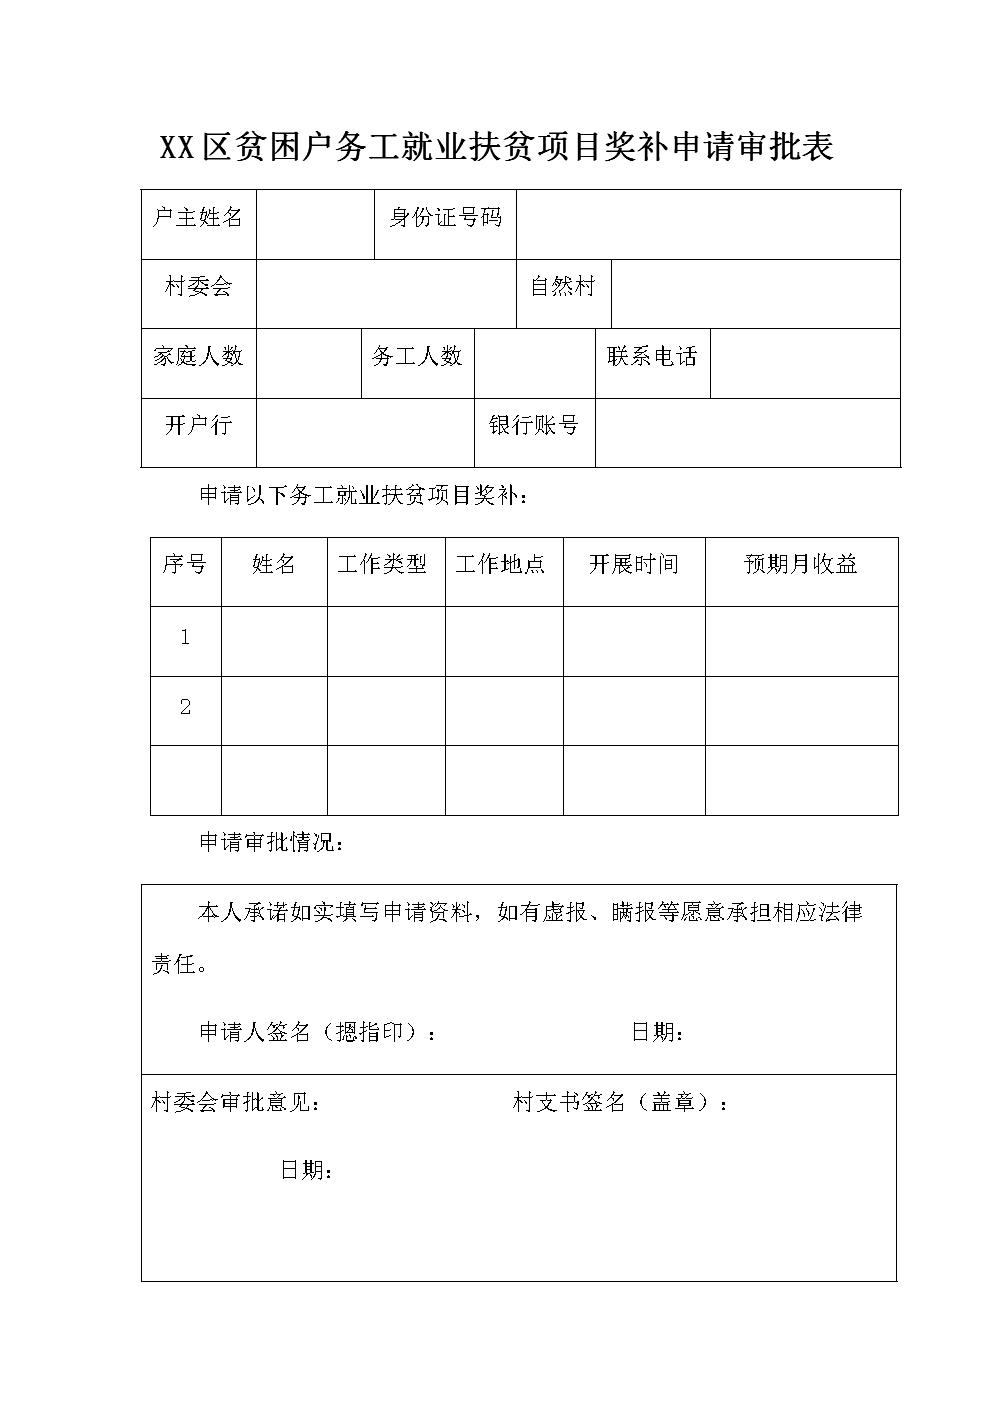 XX区贫困户务工就业扶贫项目奖补申请审批表.docx